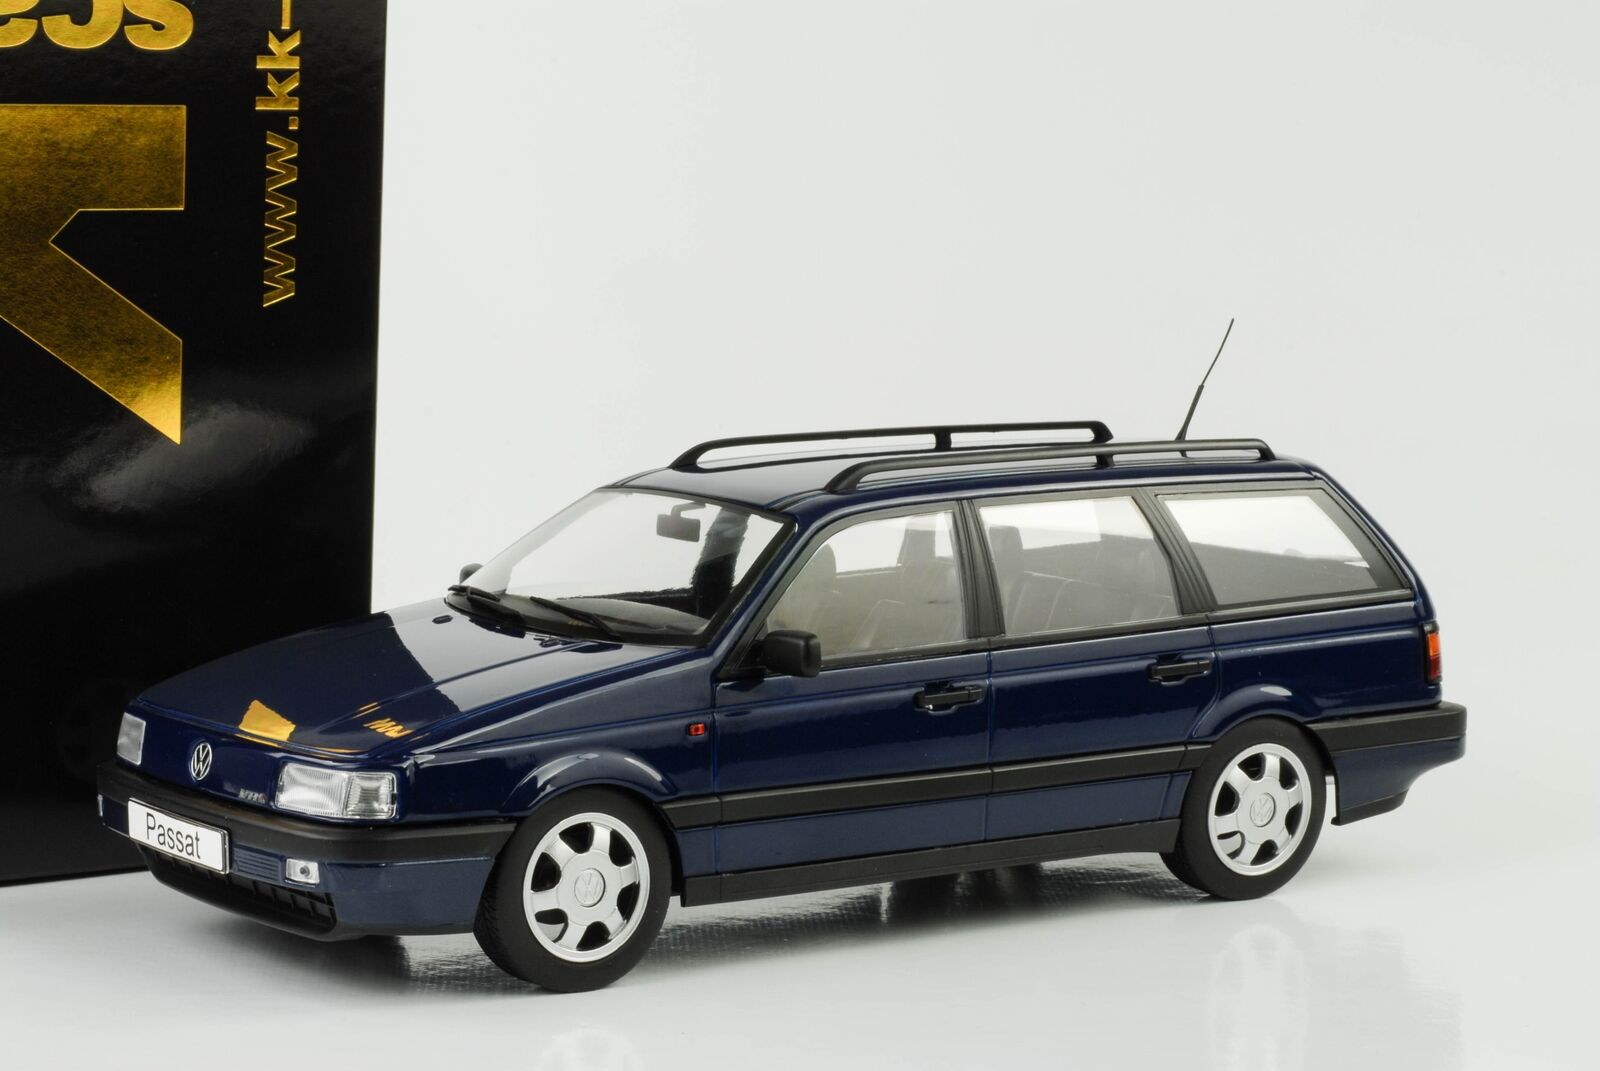 1988 Volkswagen VW Passat B3 VR6 Variant blau metallic 1 18 KK